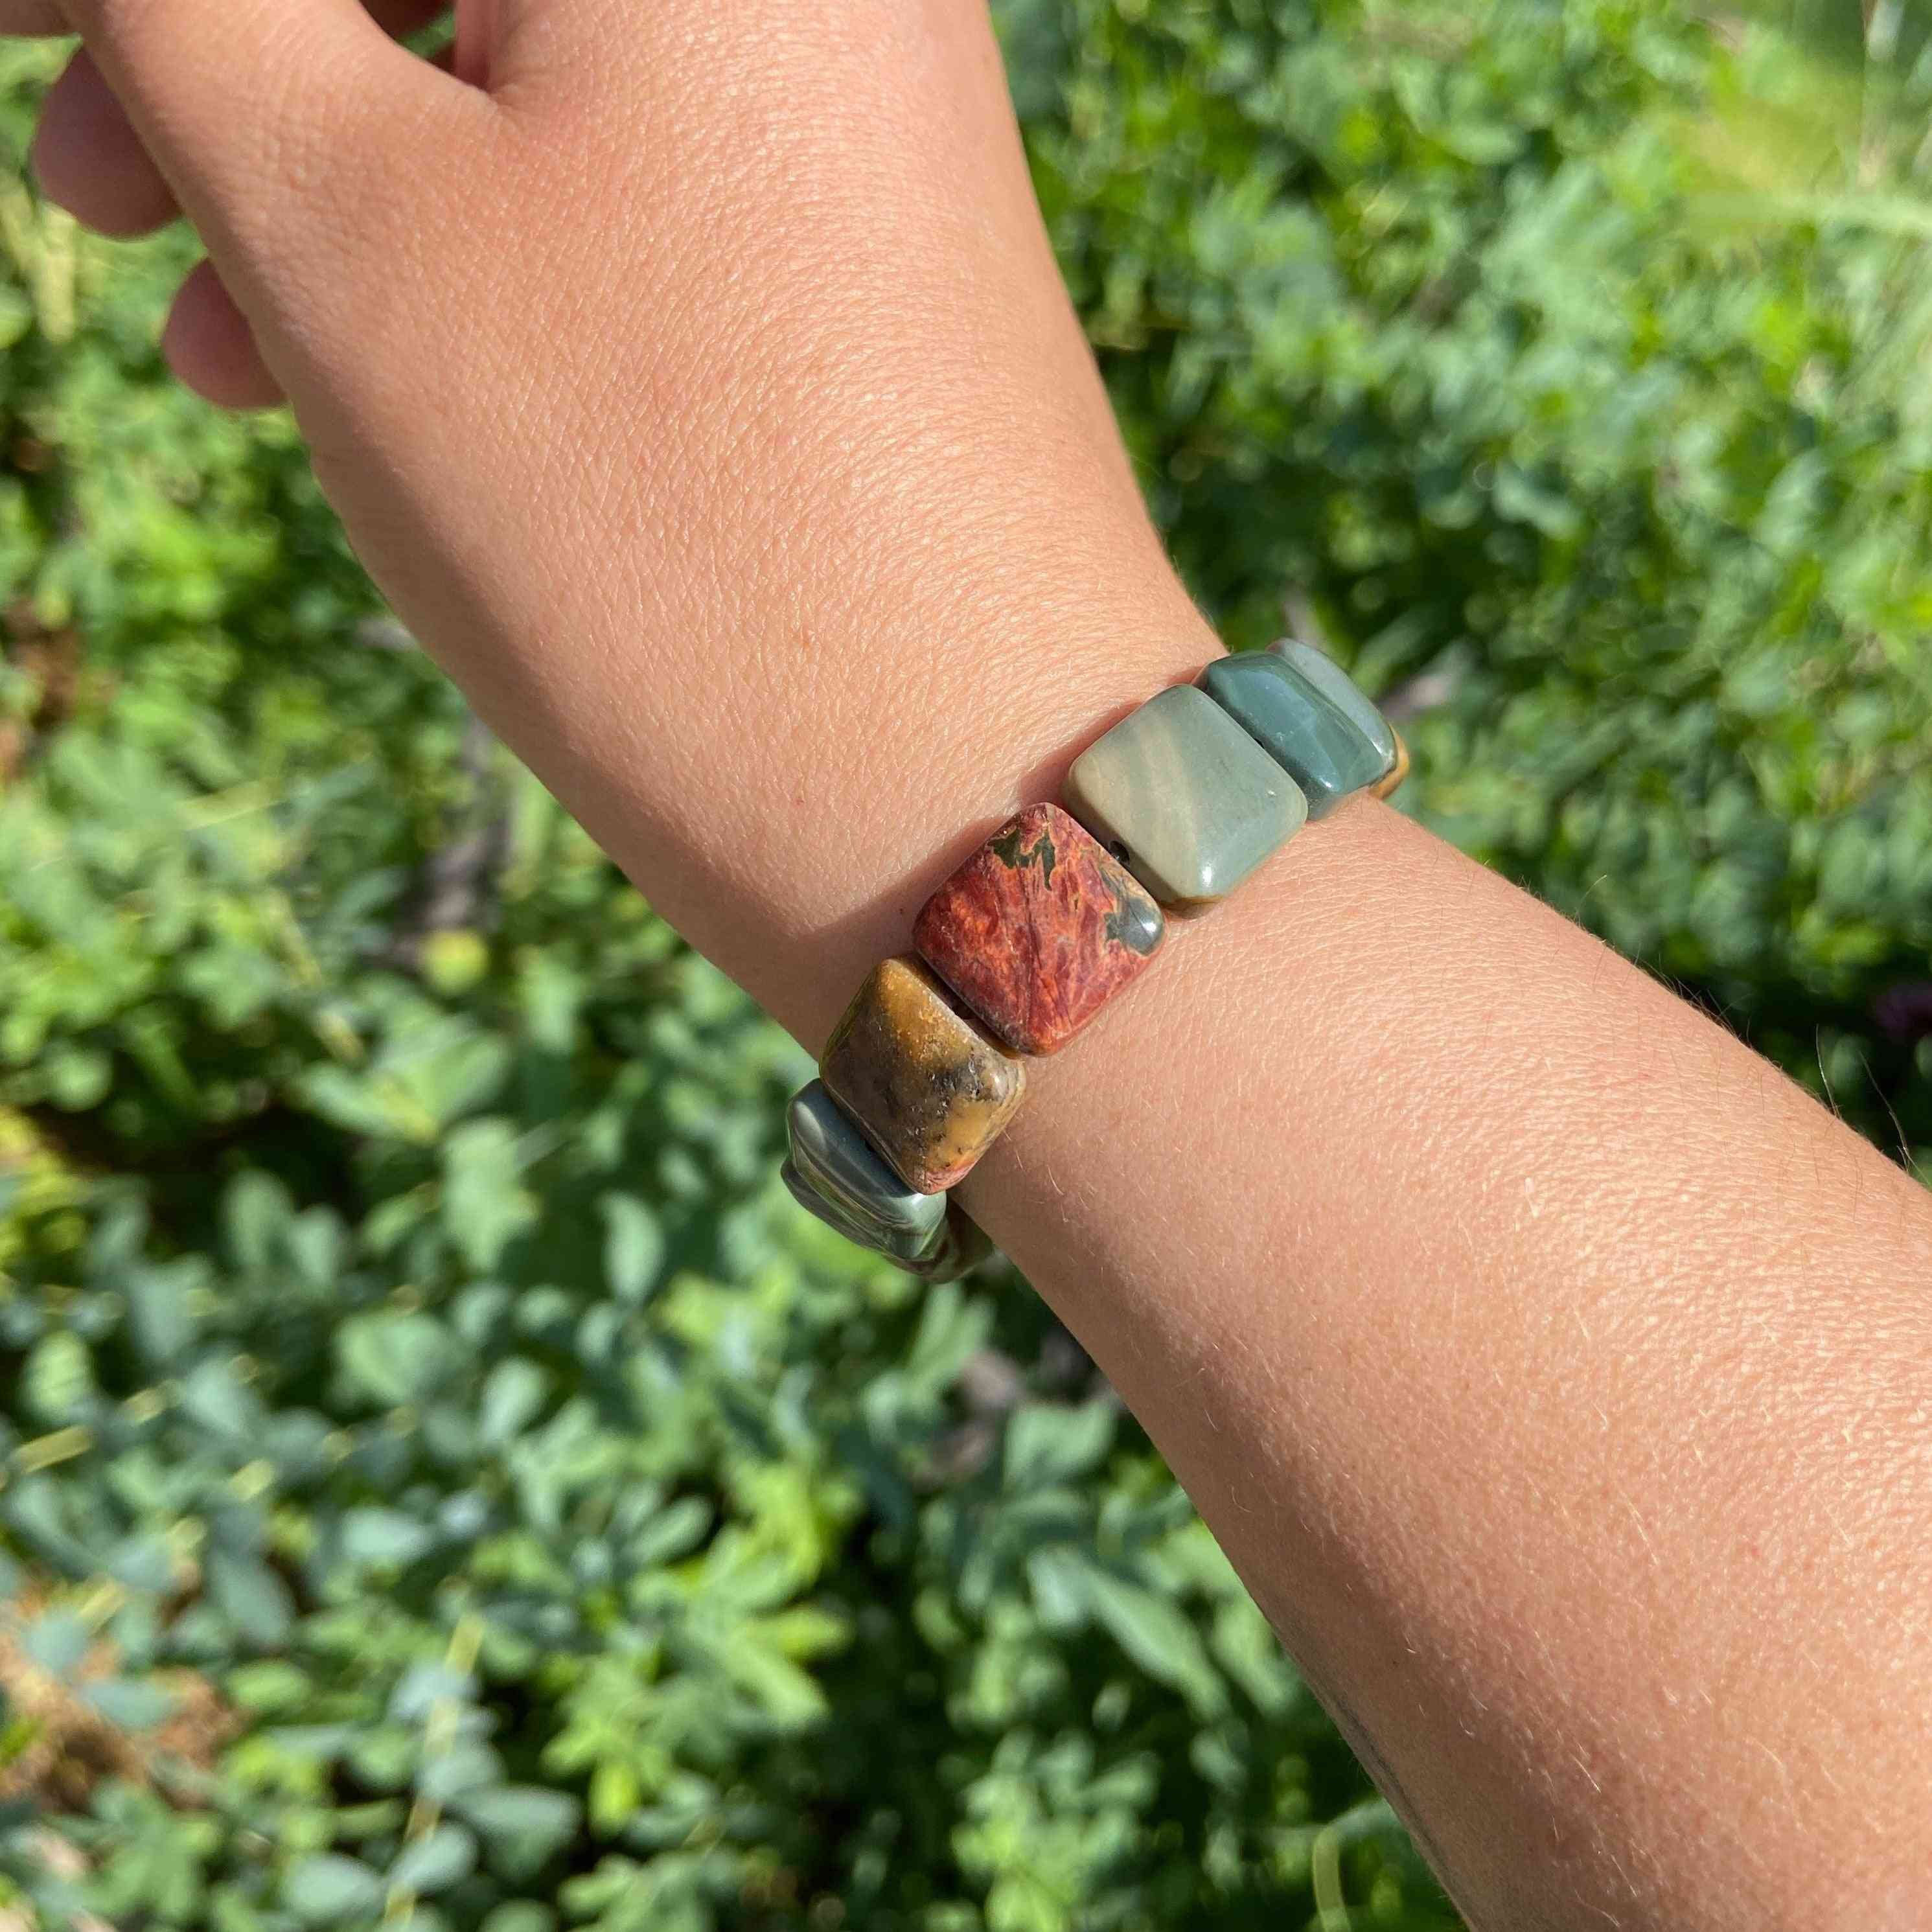 Jasper Square Cut Zinc Alloy Metal Bead Bracelet